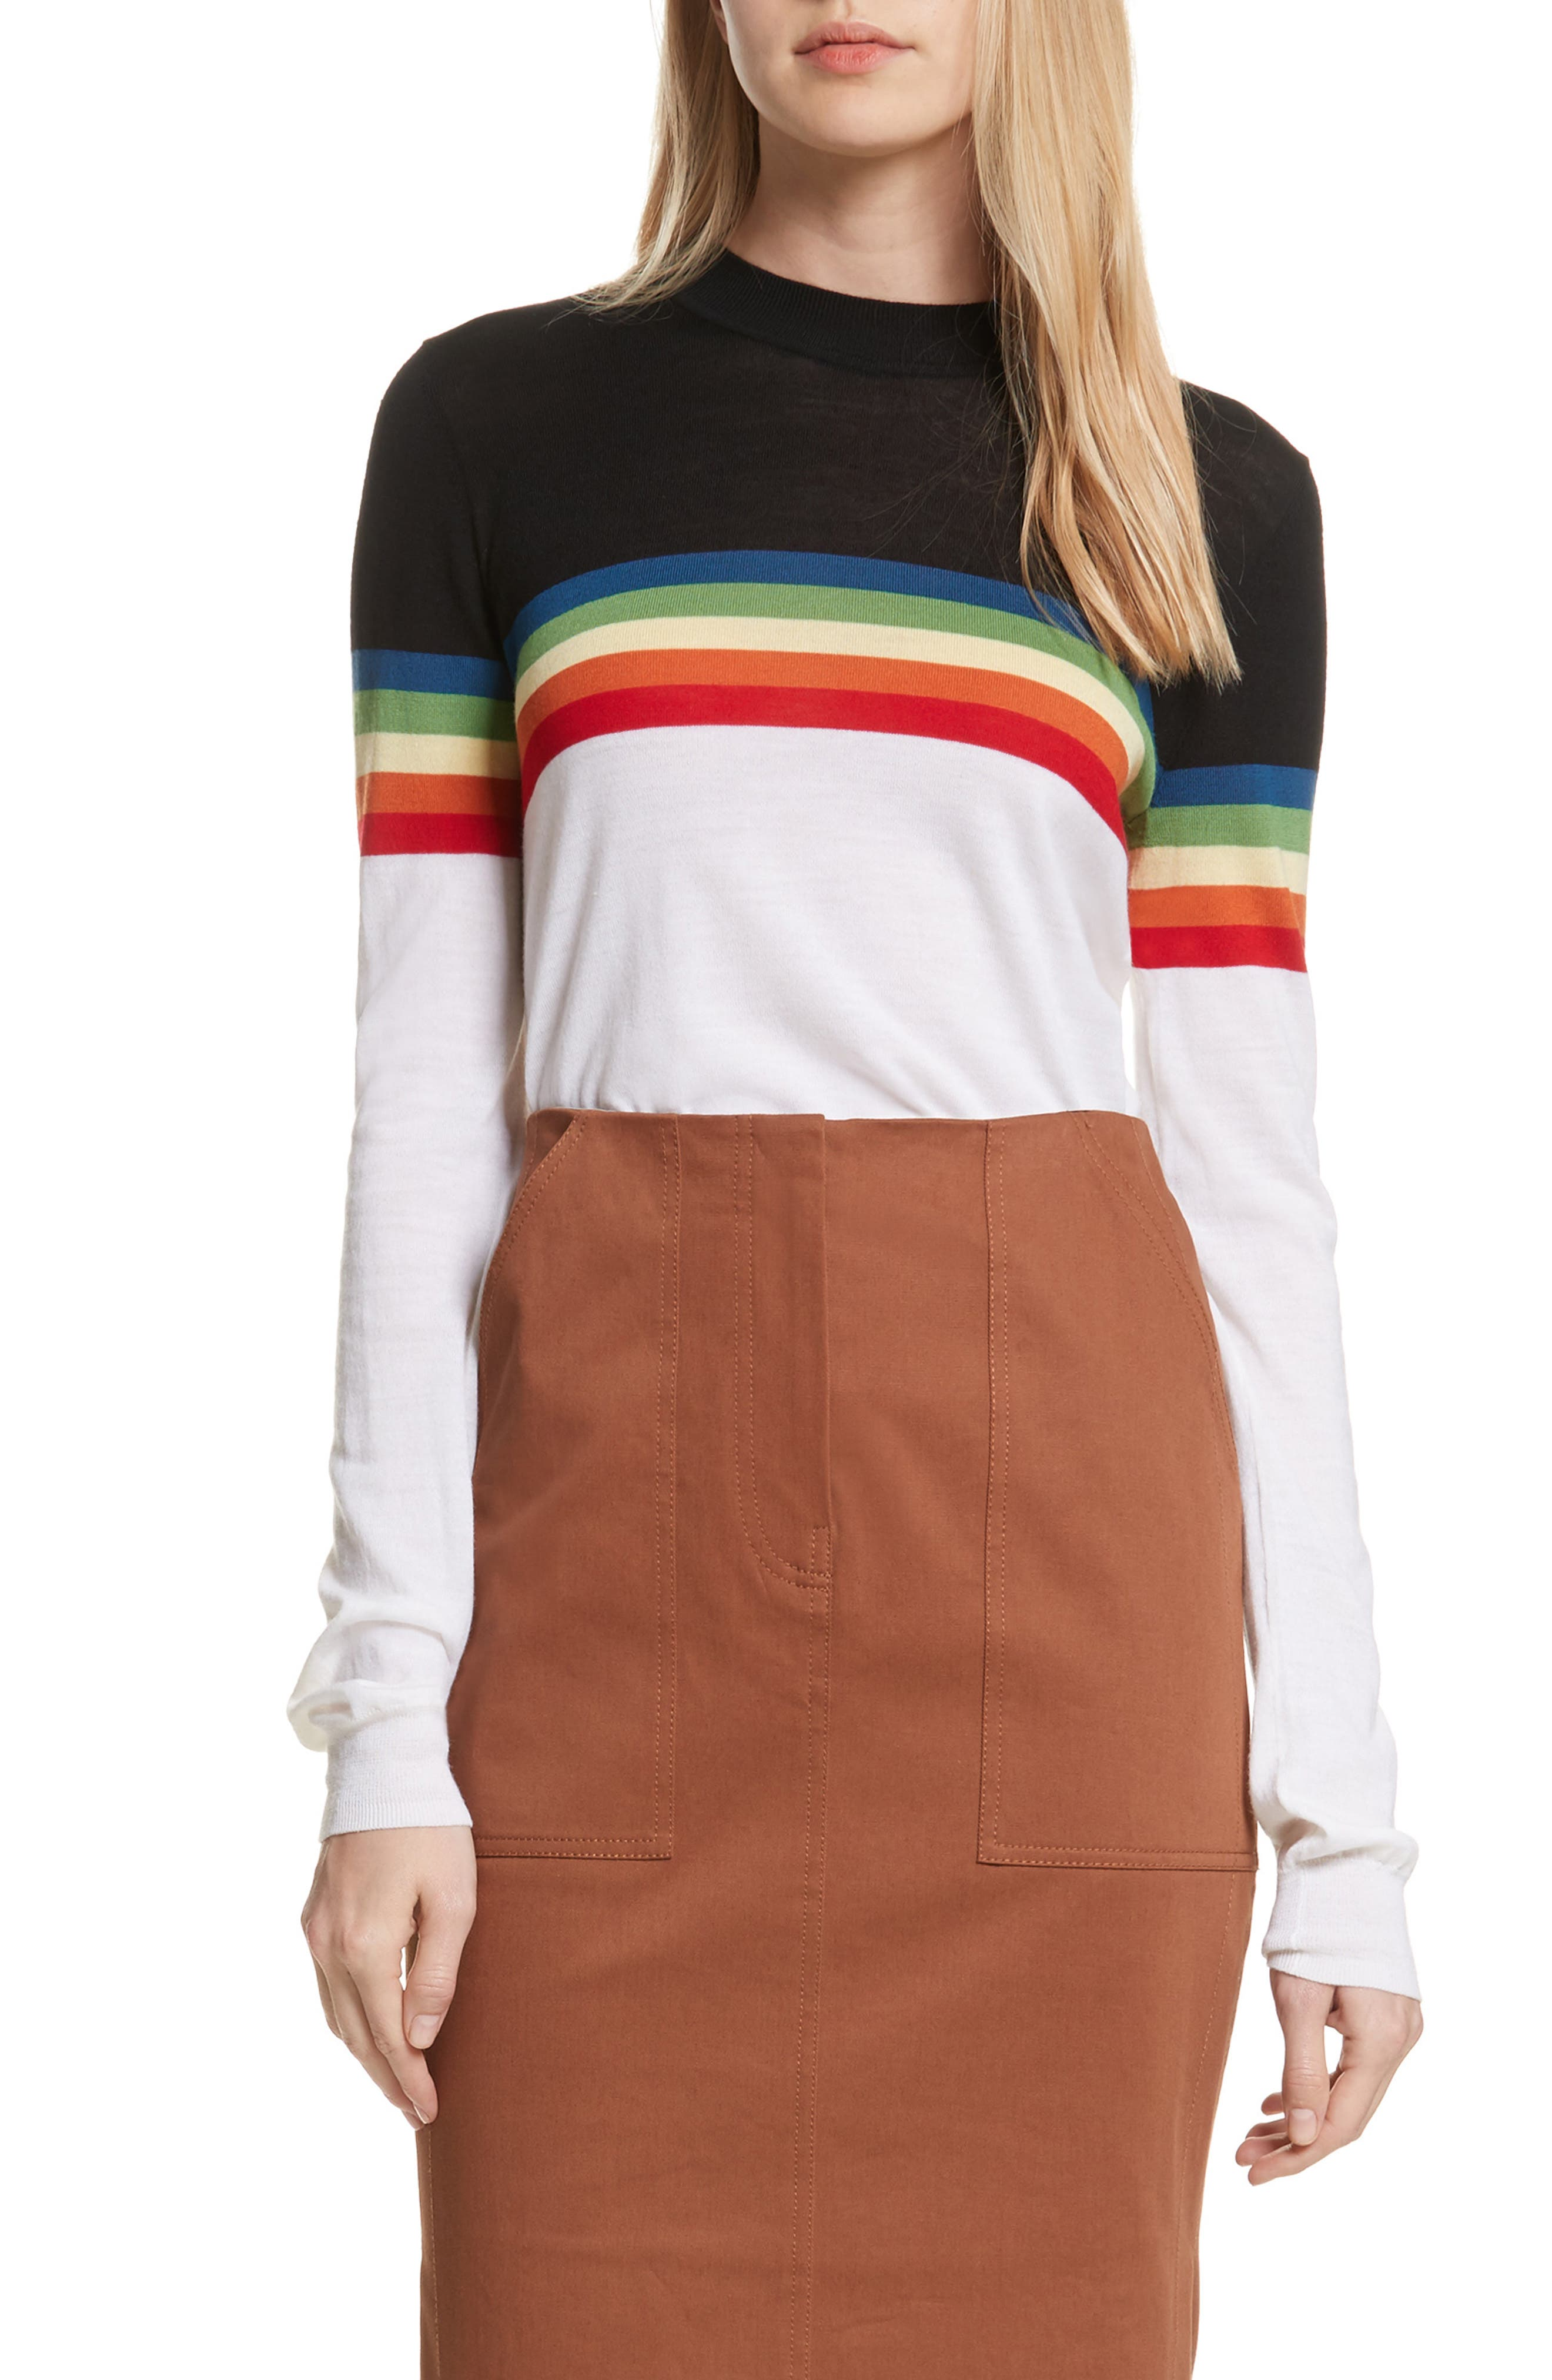 Diane von Furstenberg Rainbow Sweater,                             Main thumbnail 1, color,                             107